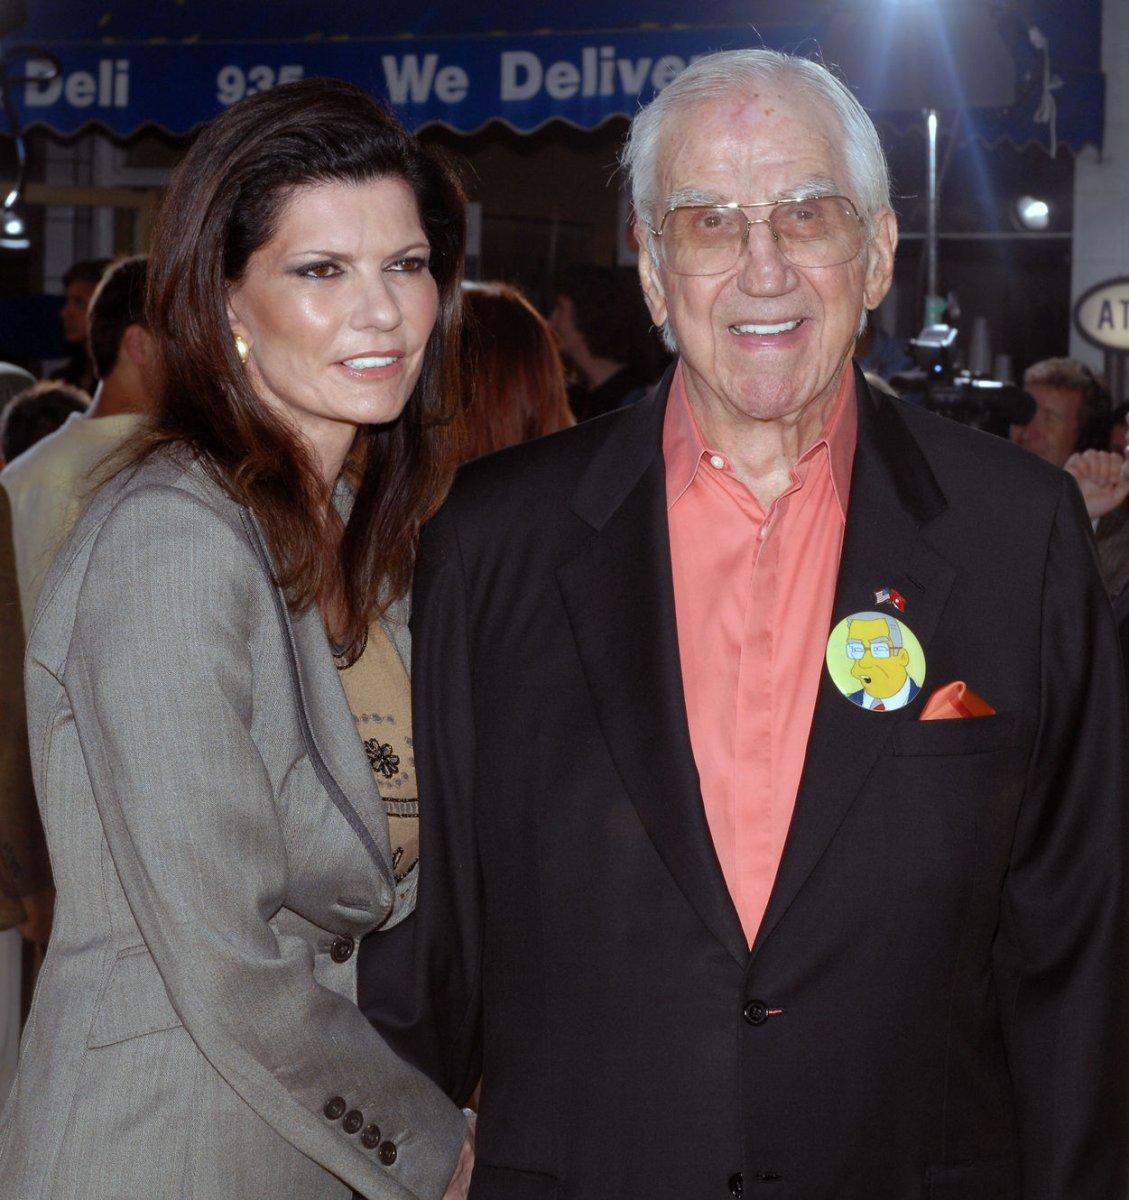 Hollywood remembers Ed McMahon - UPI.com